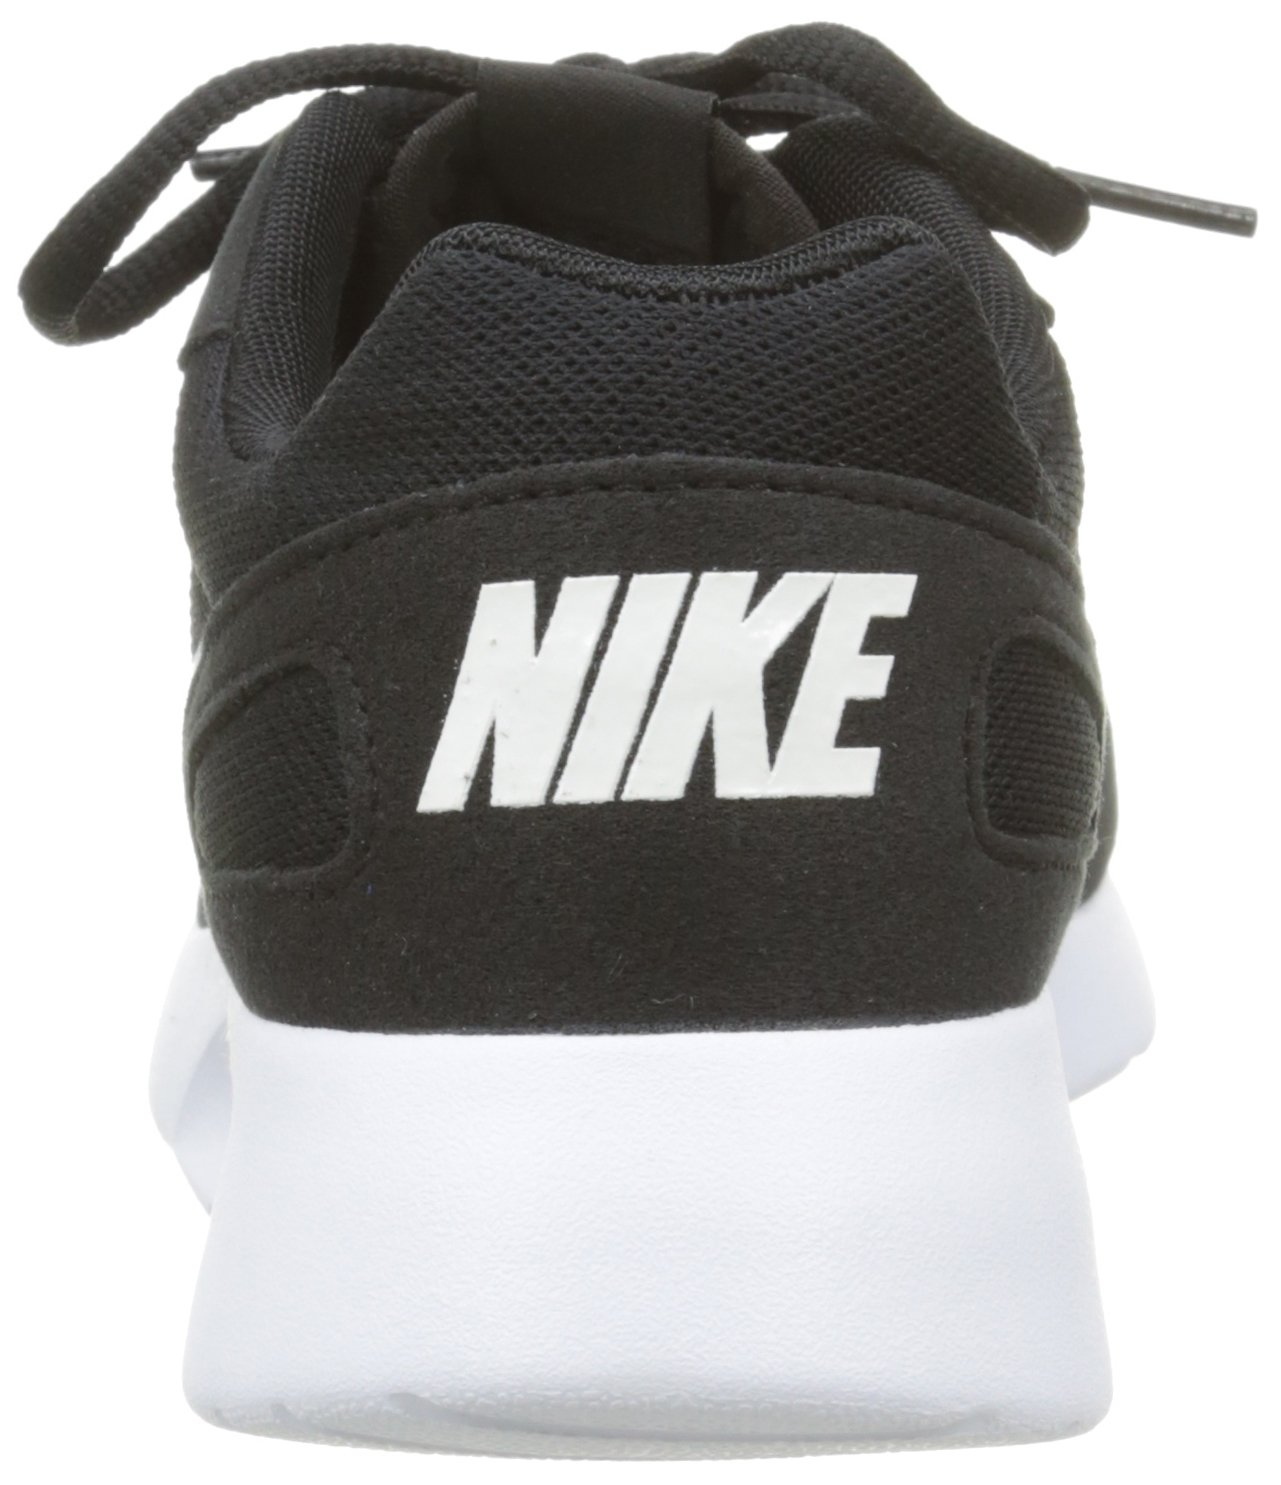 Nike Women's Kaishi Running US|Black Shoe B01HFNF5FE 9.5 D(M) US|Black Running cf0d2a